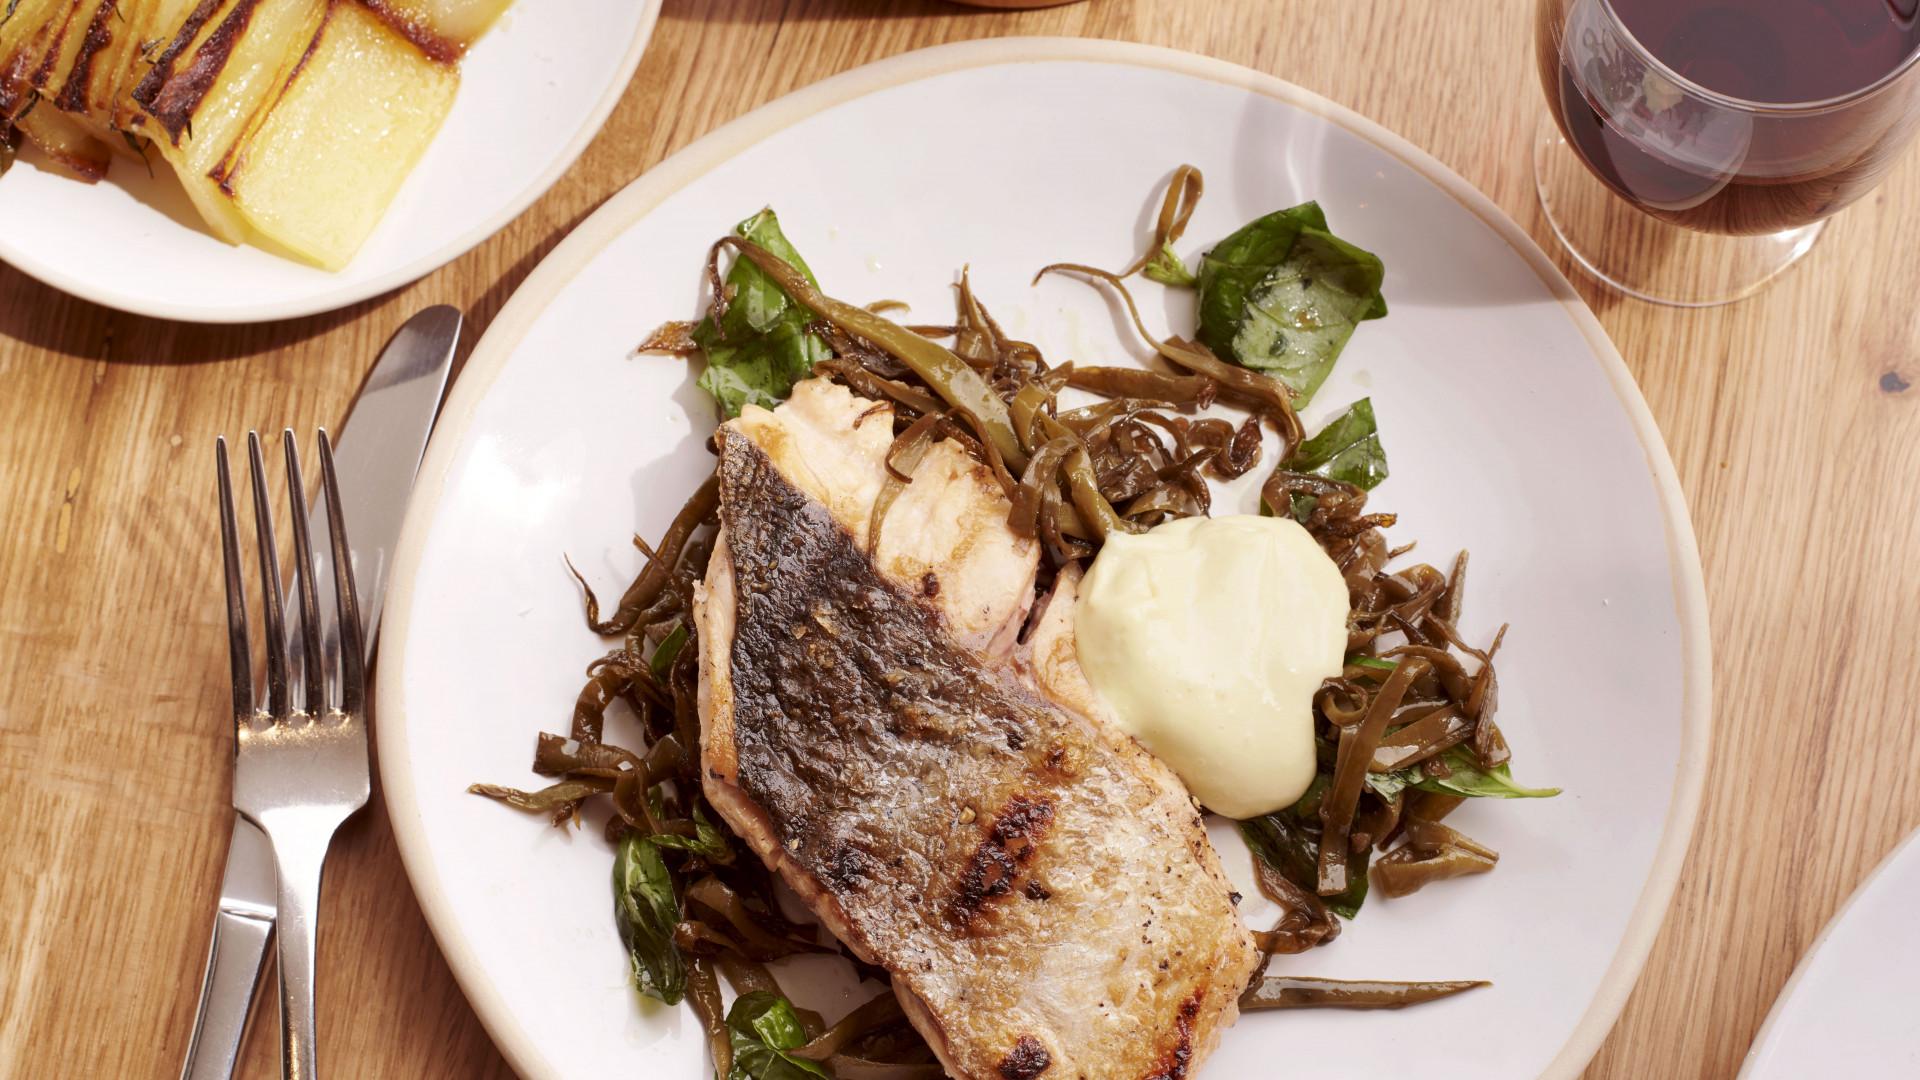 A fish dish at Sardine